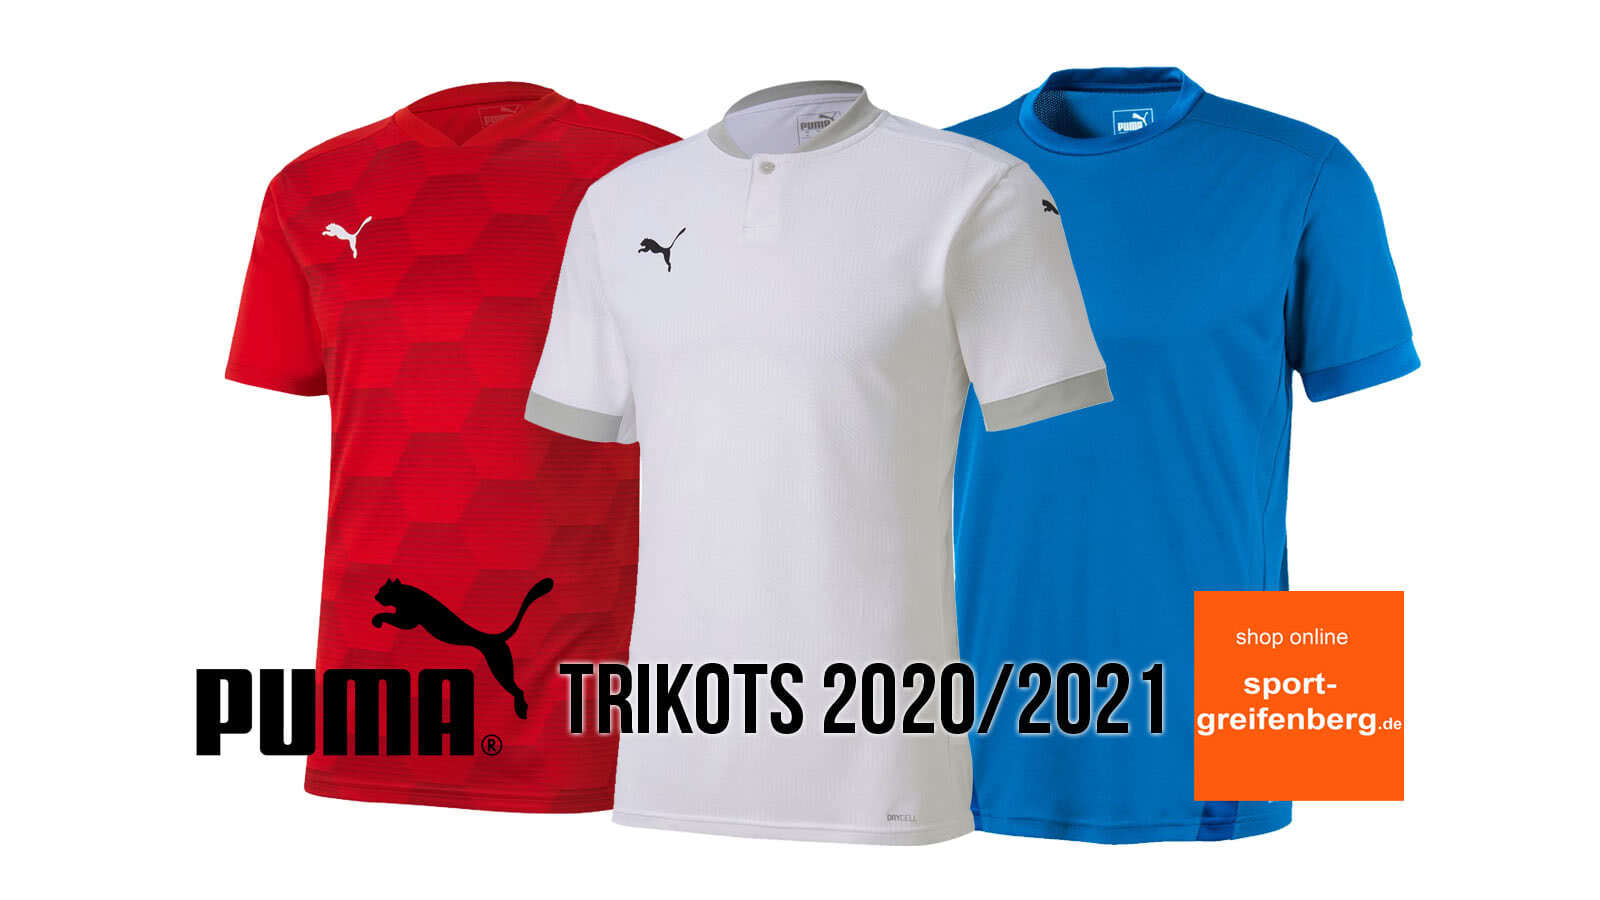 Die puma trikots 2020 2021 teamgoal und teamfinal